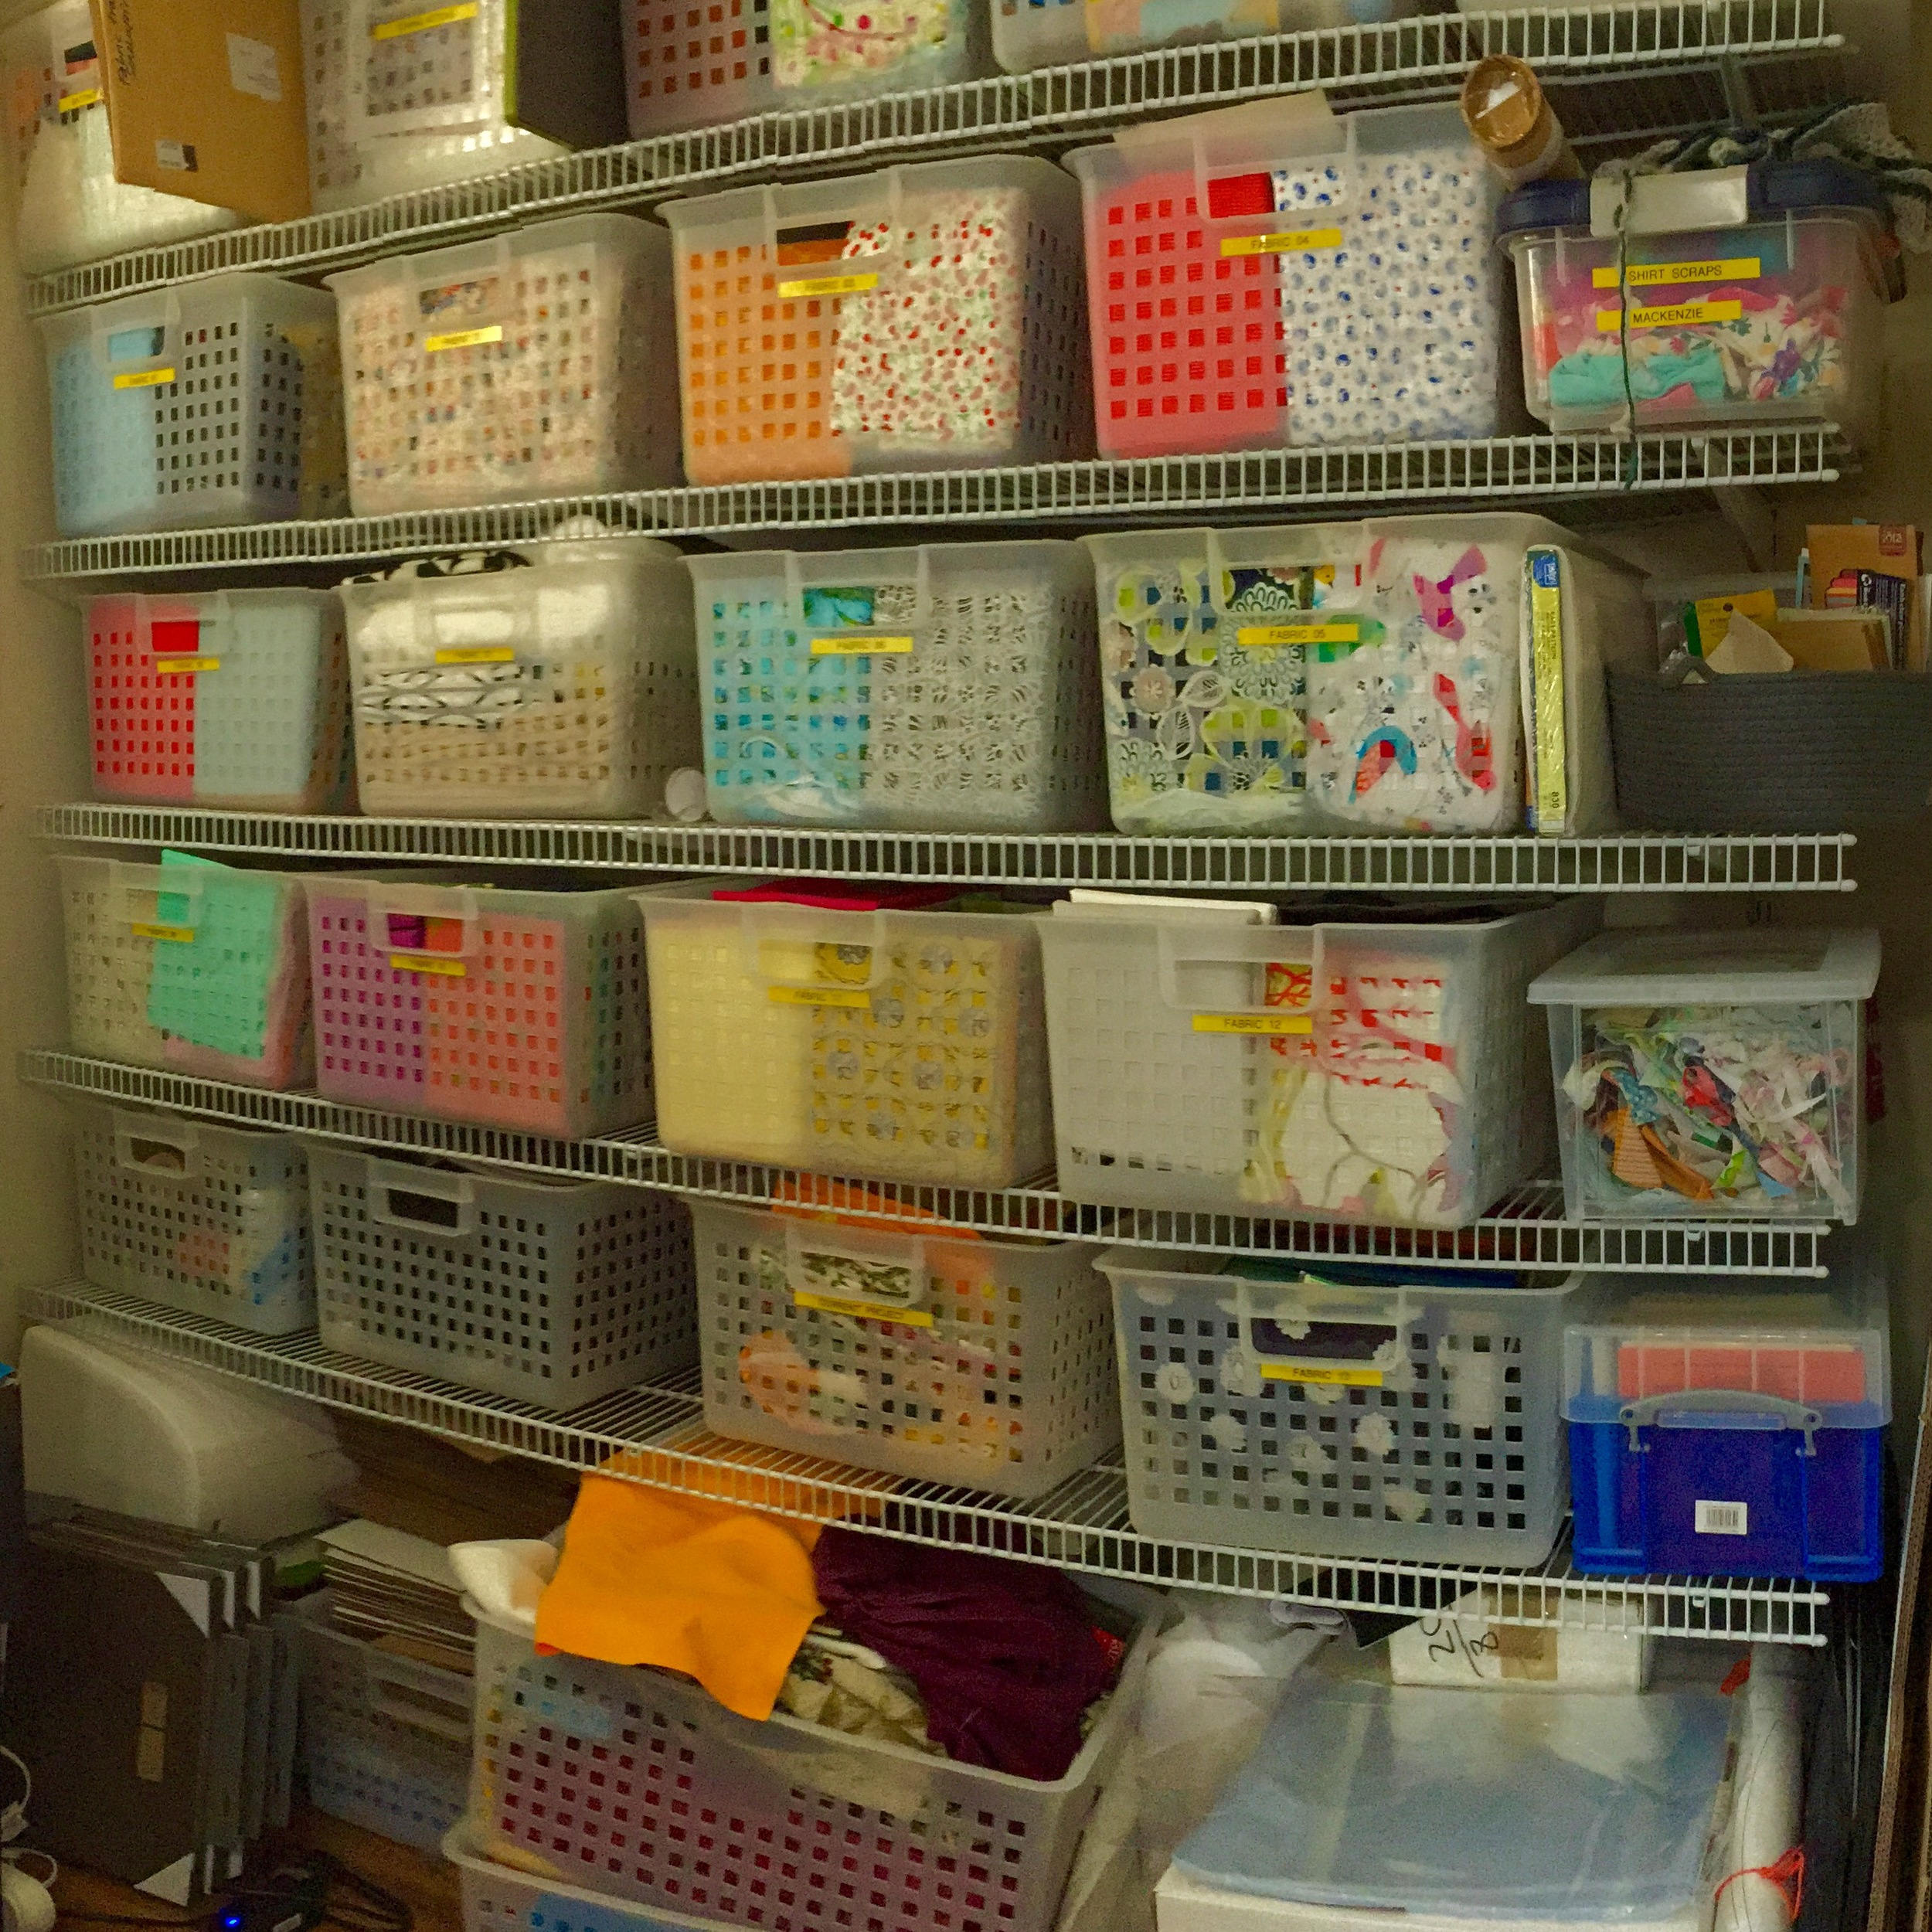 My old fabric storage system